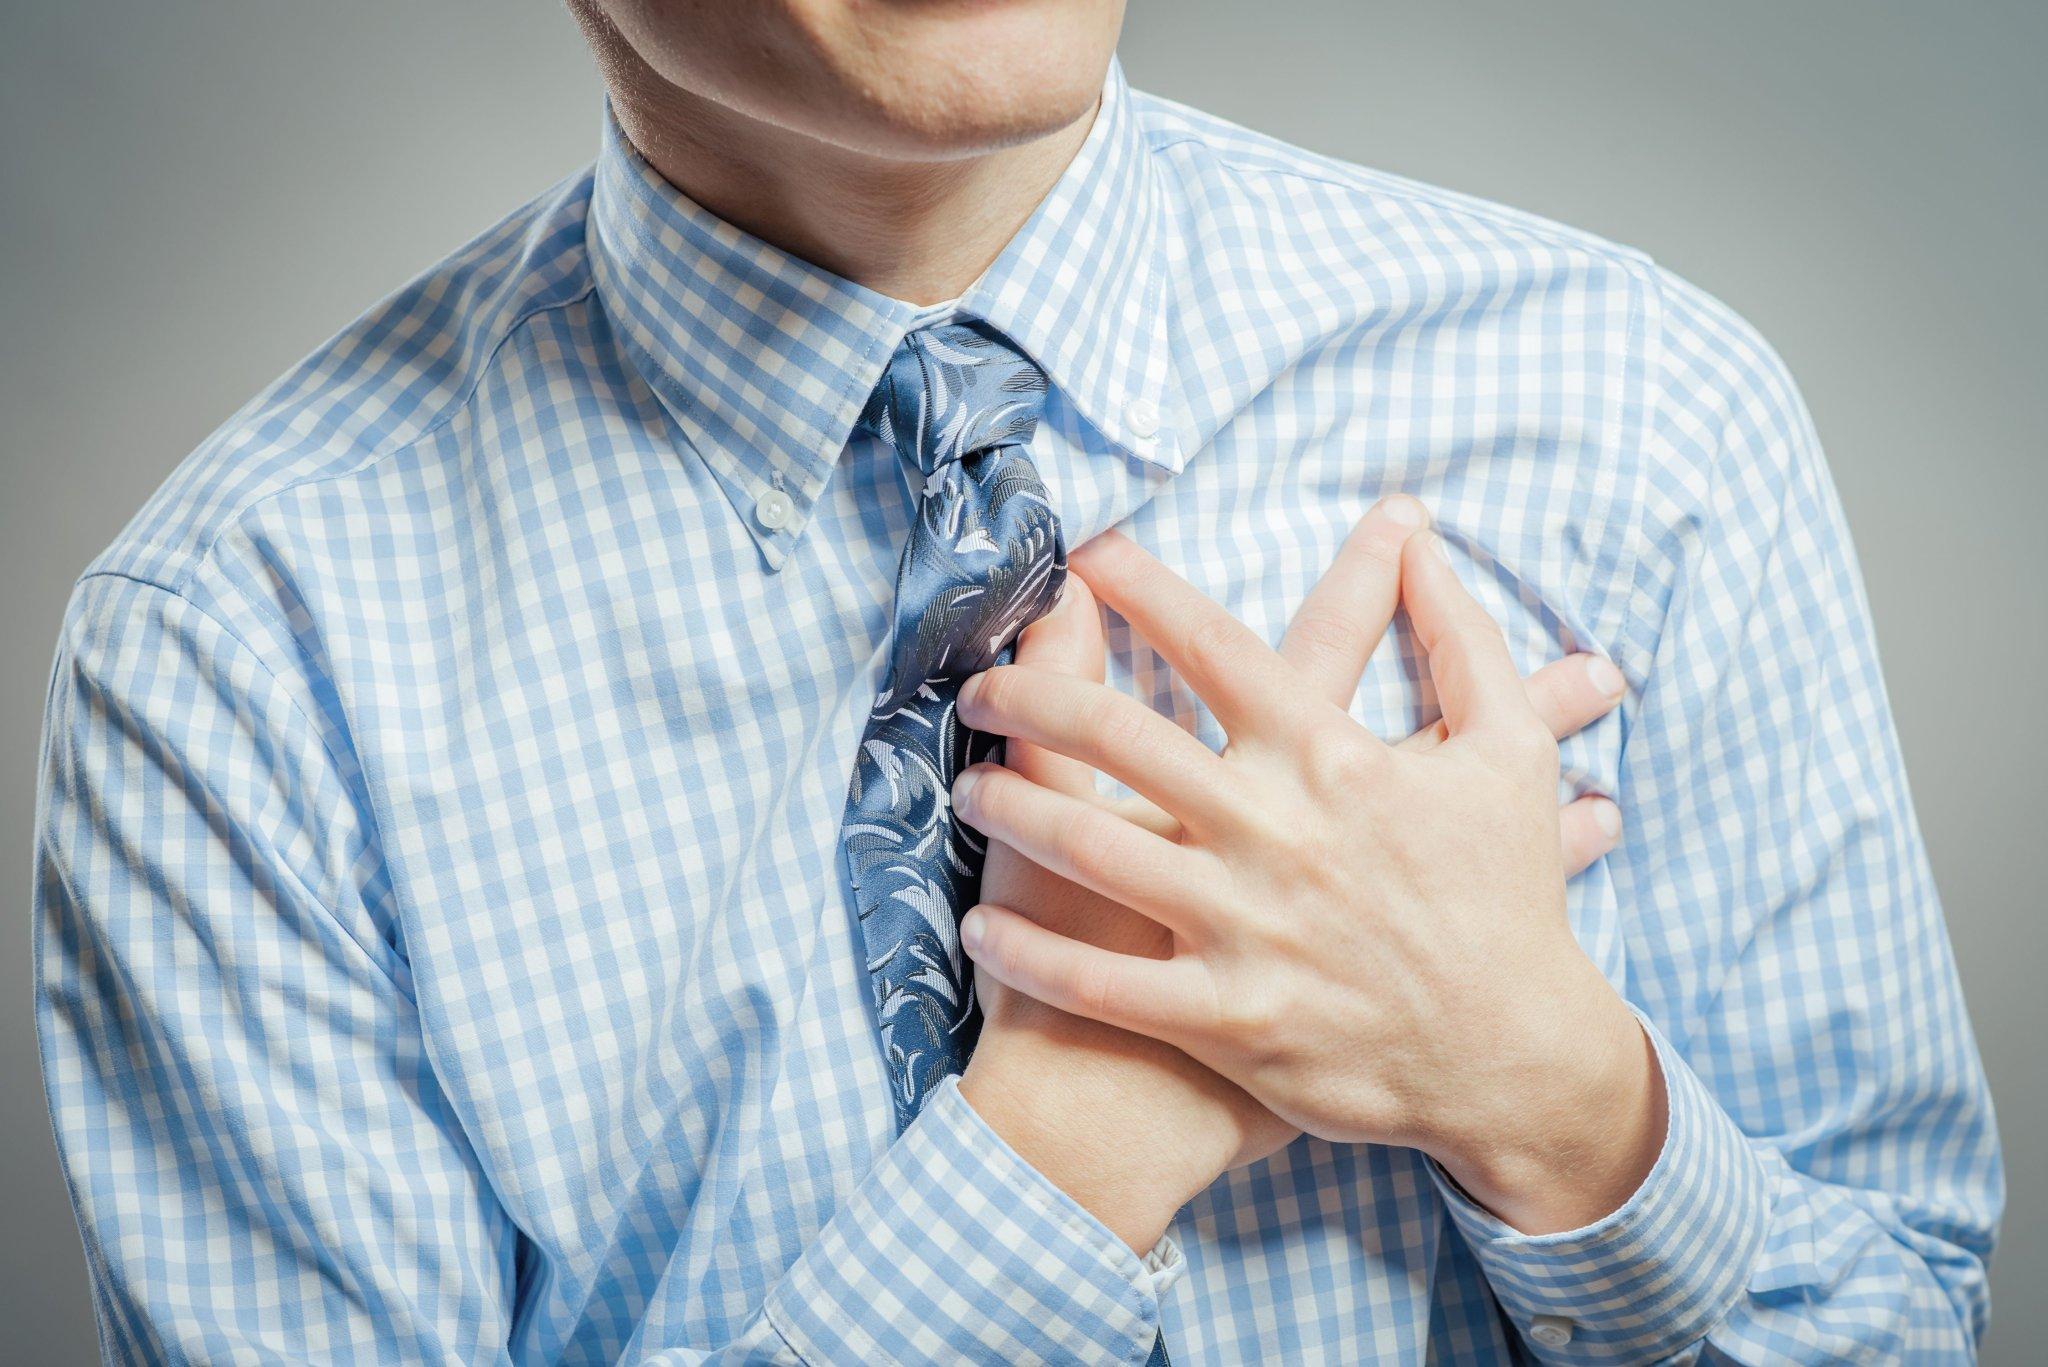 Pulmonary Embolism: Symptoms, Causes, and Treatments